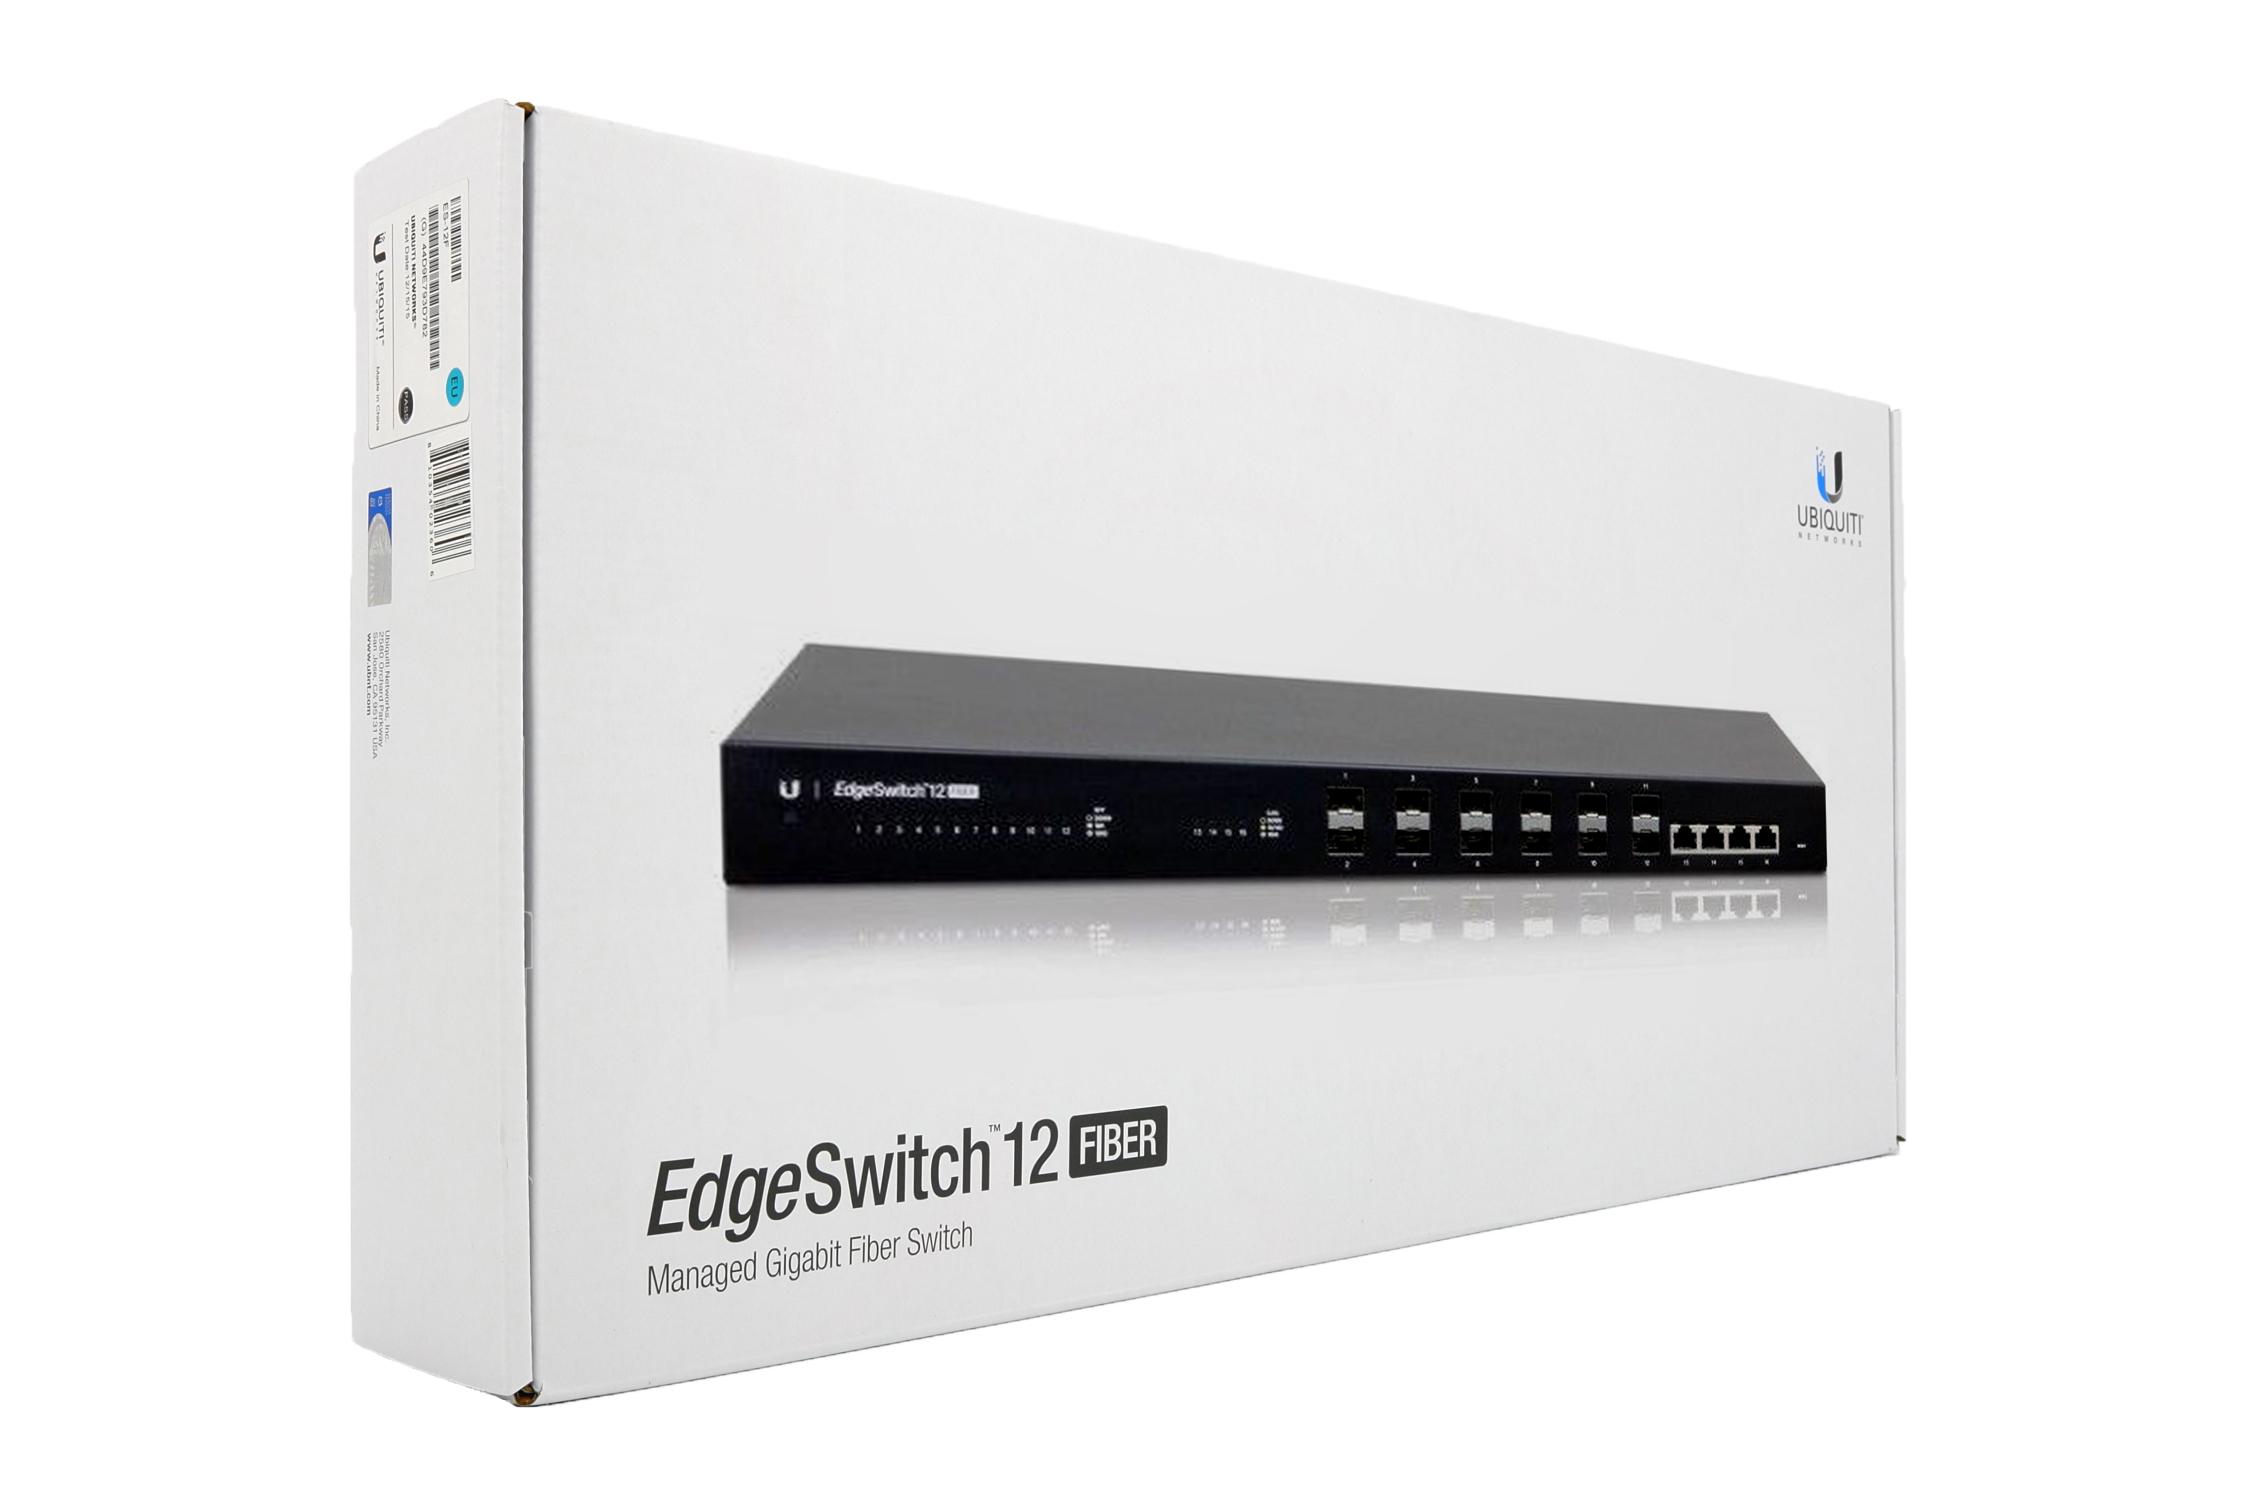 UBiQUiTi EdgeSwitch 12 Port Fiber Switch ES-12F   Help Tech